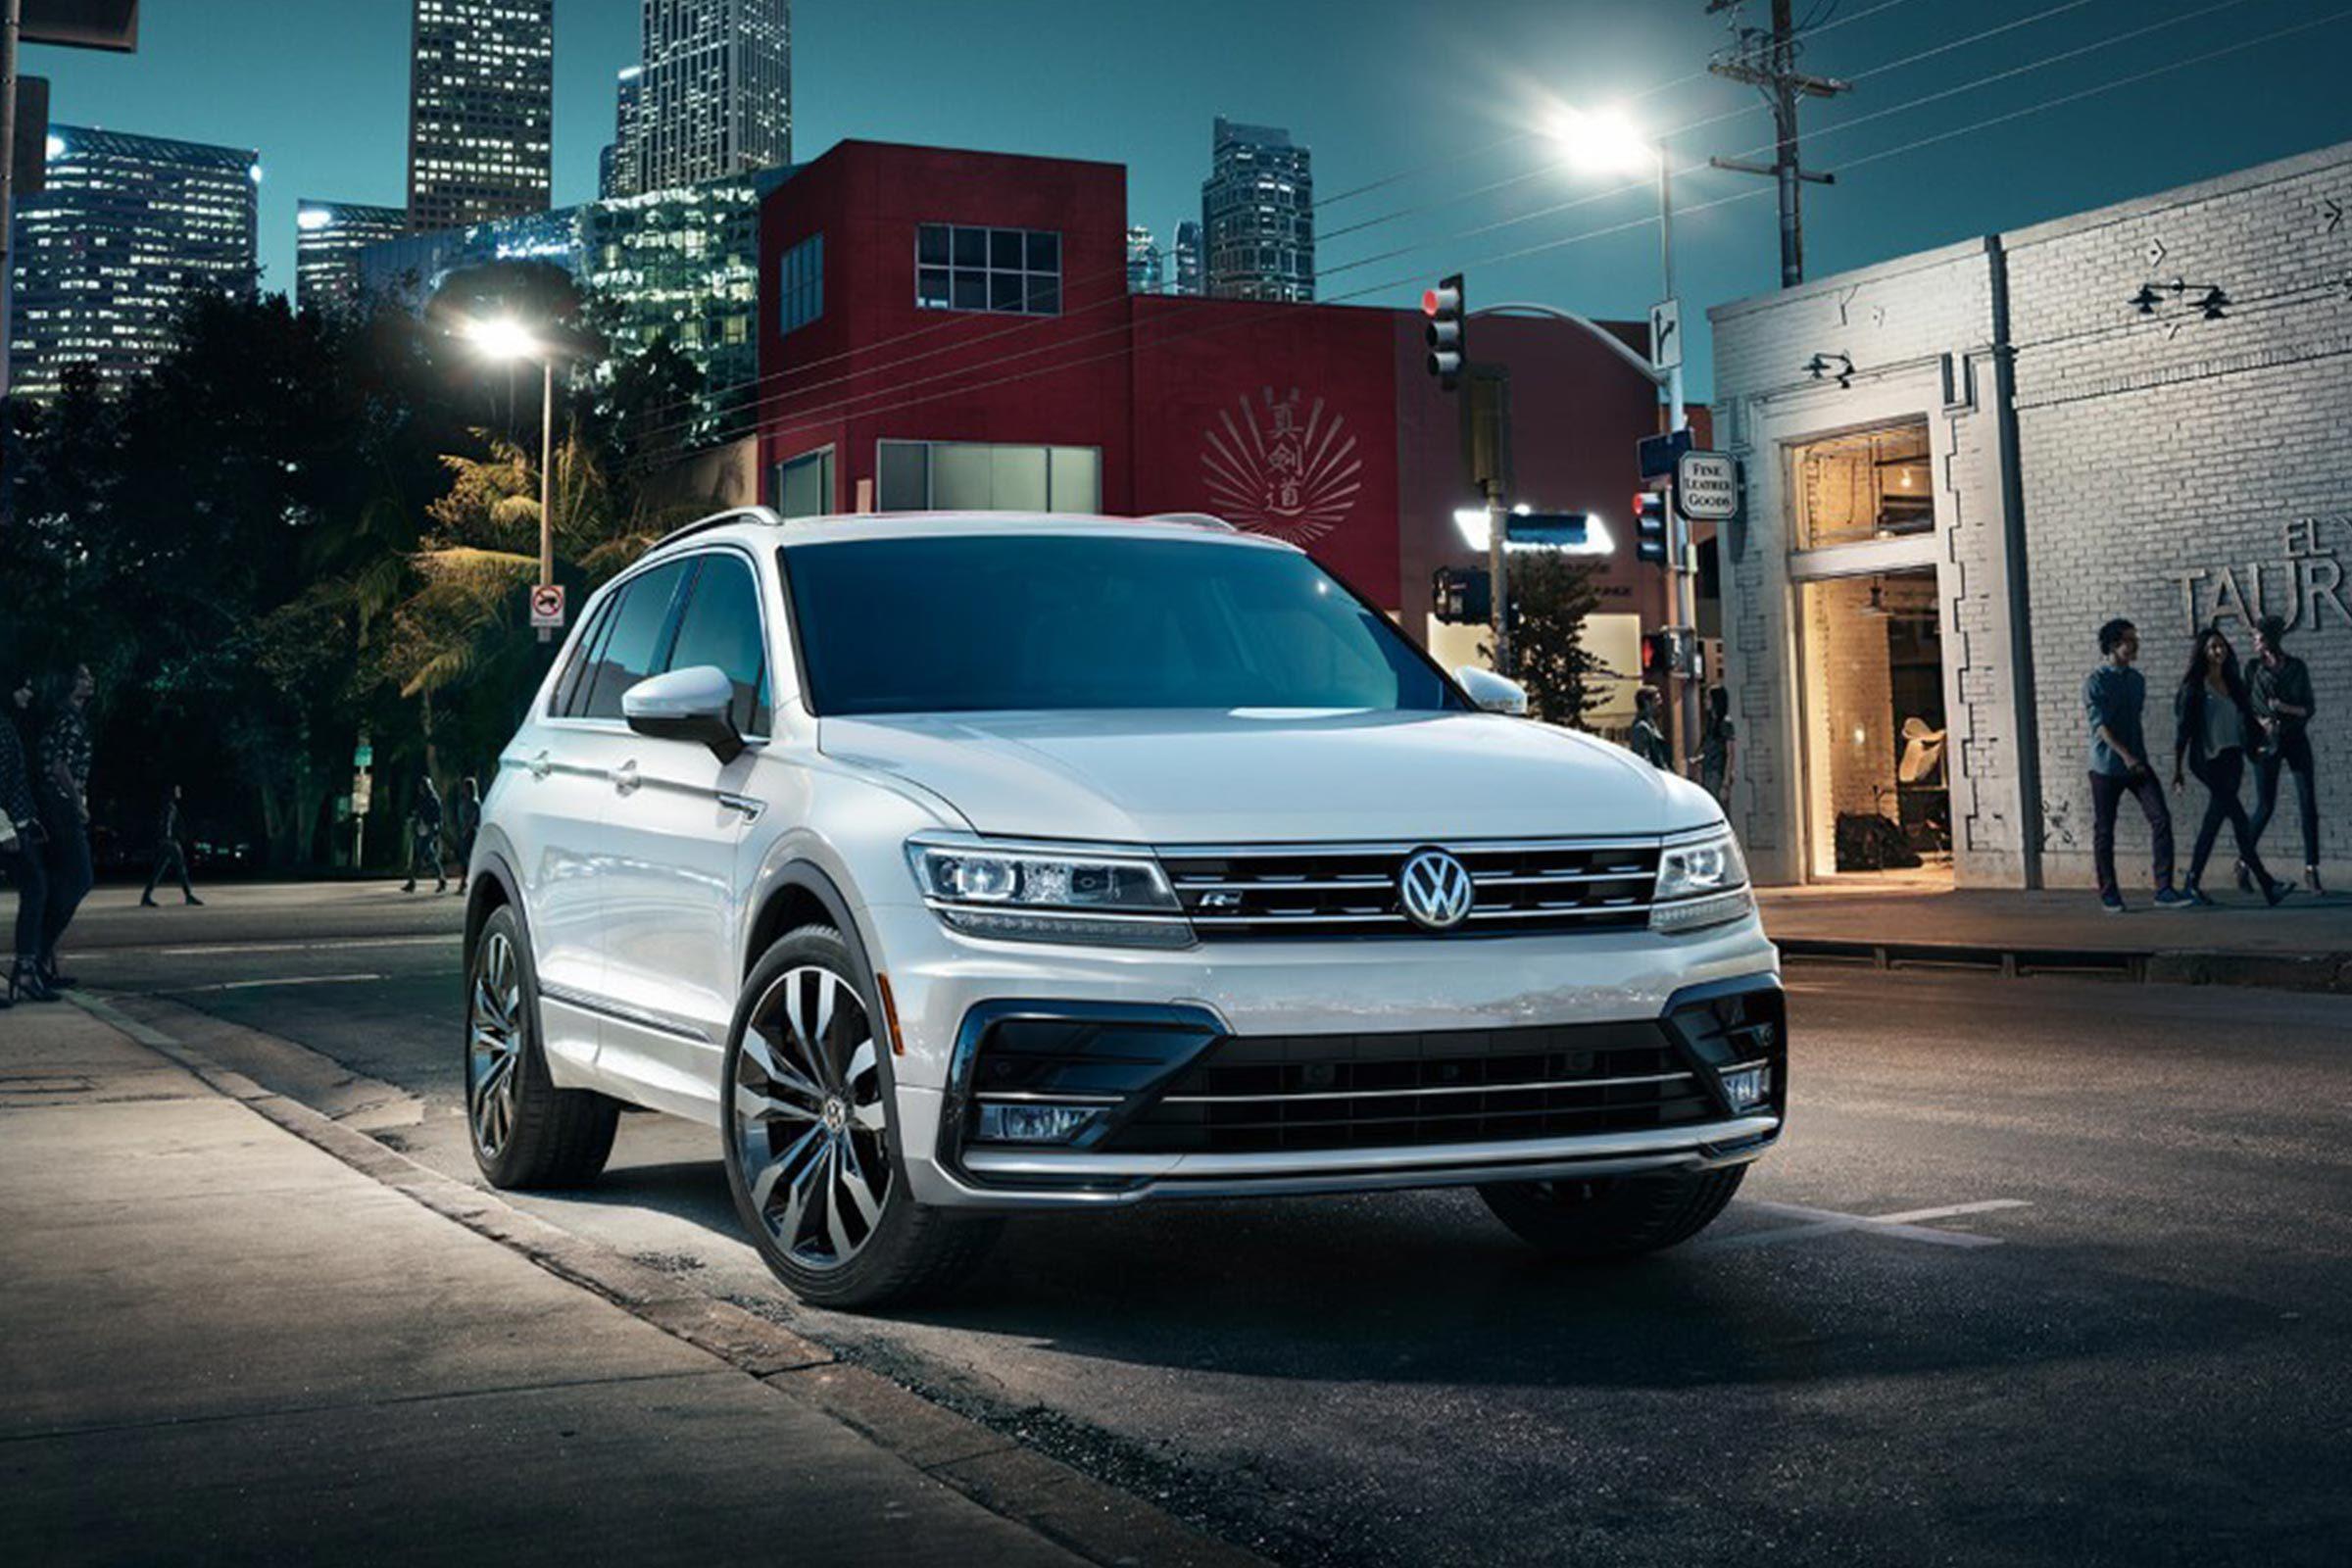 2019-Volkswagen-Tiguan-SE-with-4Motion